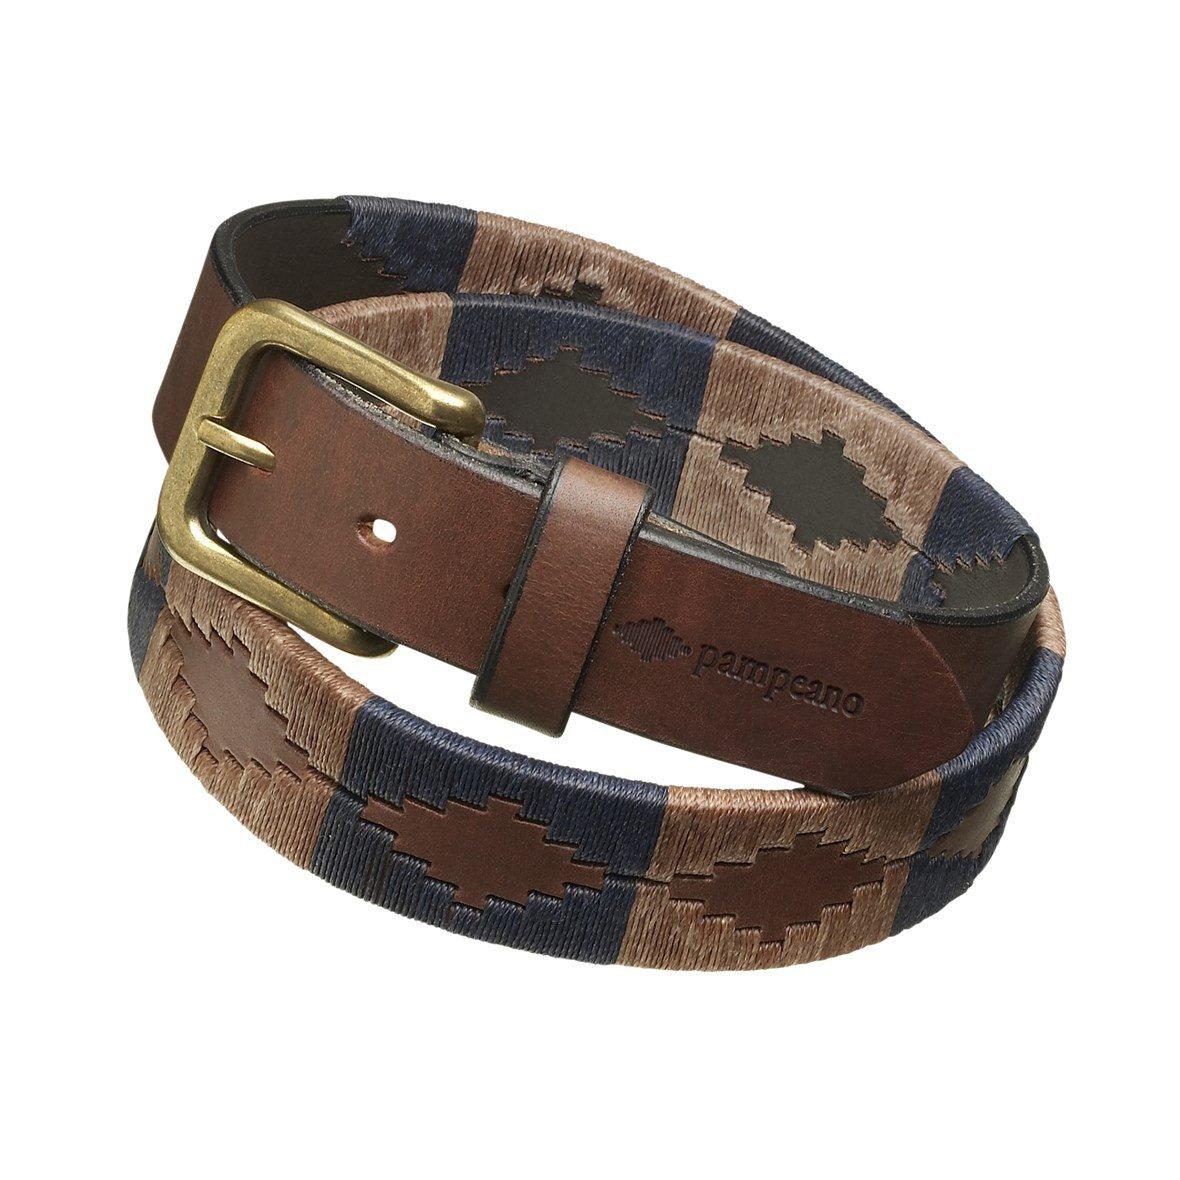 Pampeano-Classic-Leather-Polo-Belt-Jefe